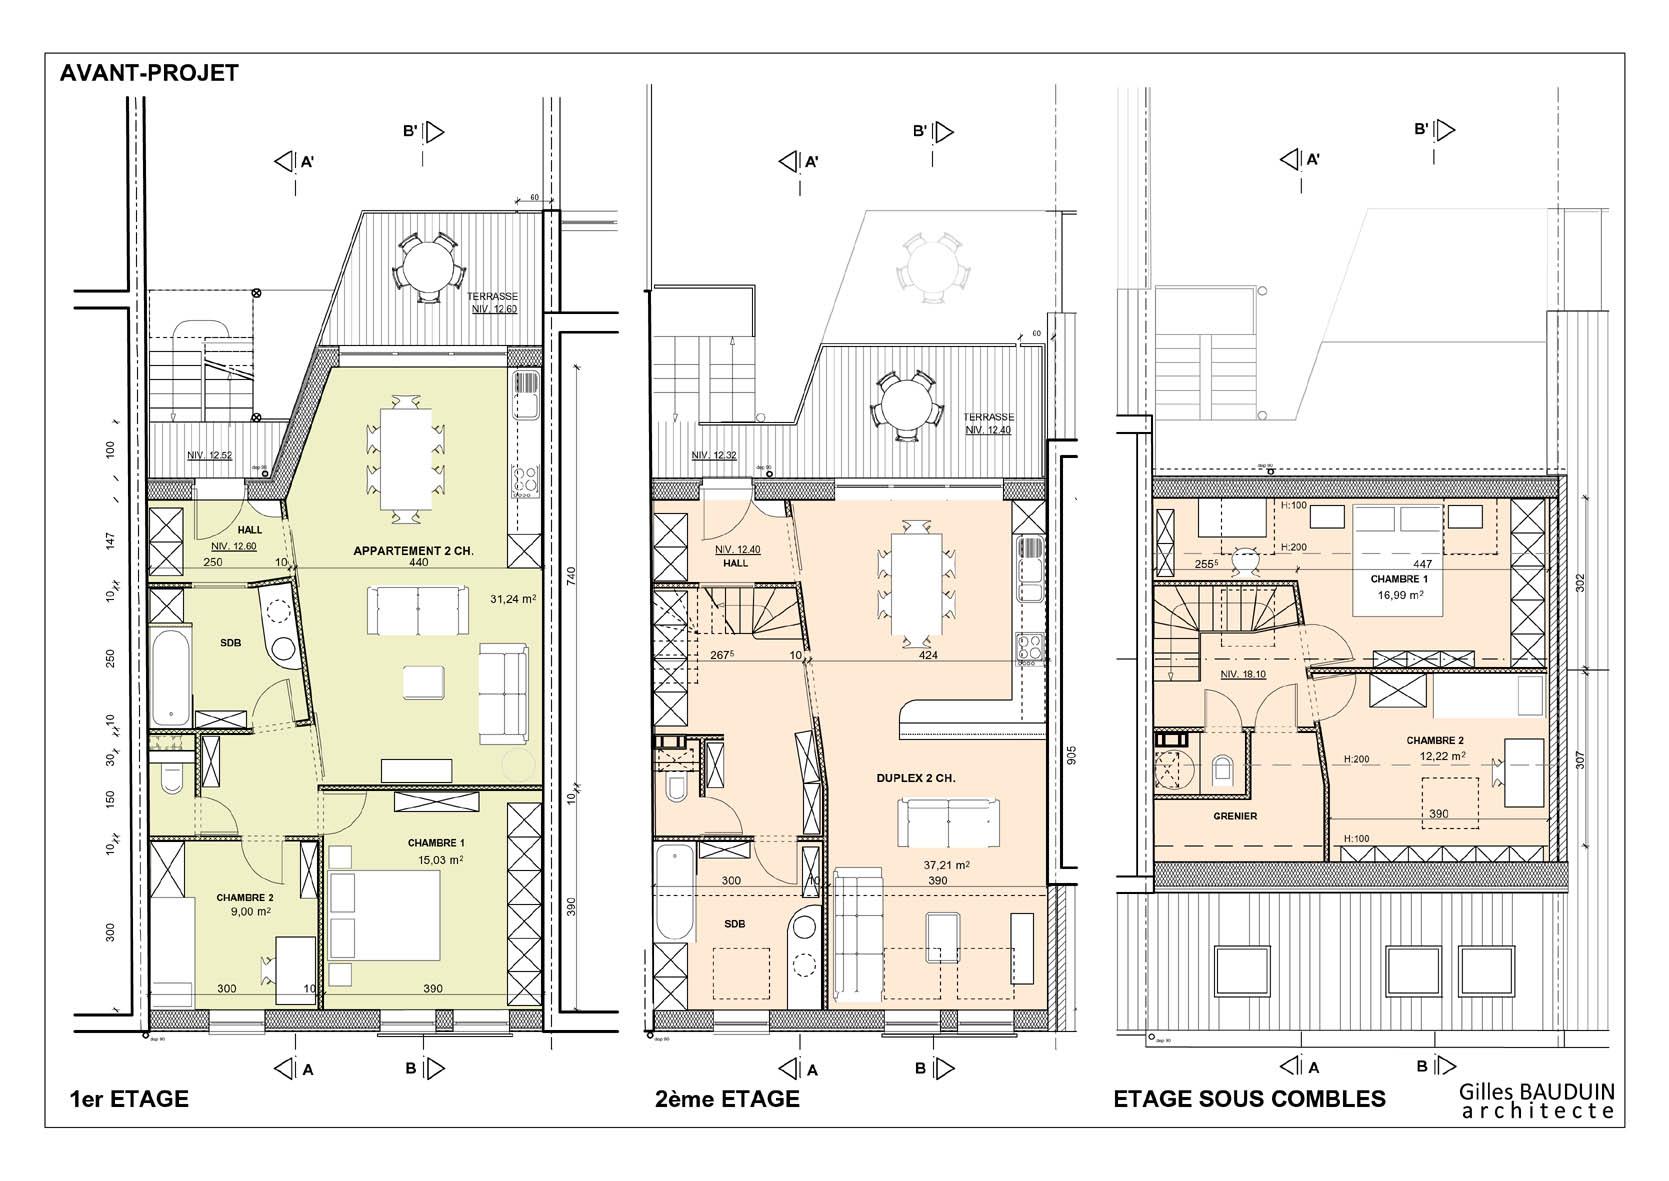 Plan maison de ville mitoyenne ventana blog - Plan maison de ville mitoyenne ...